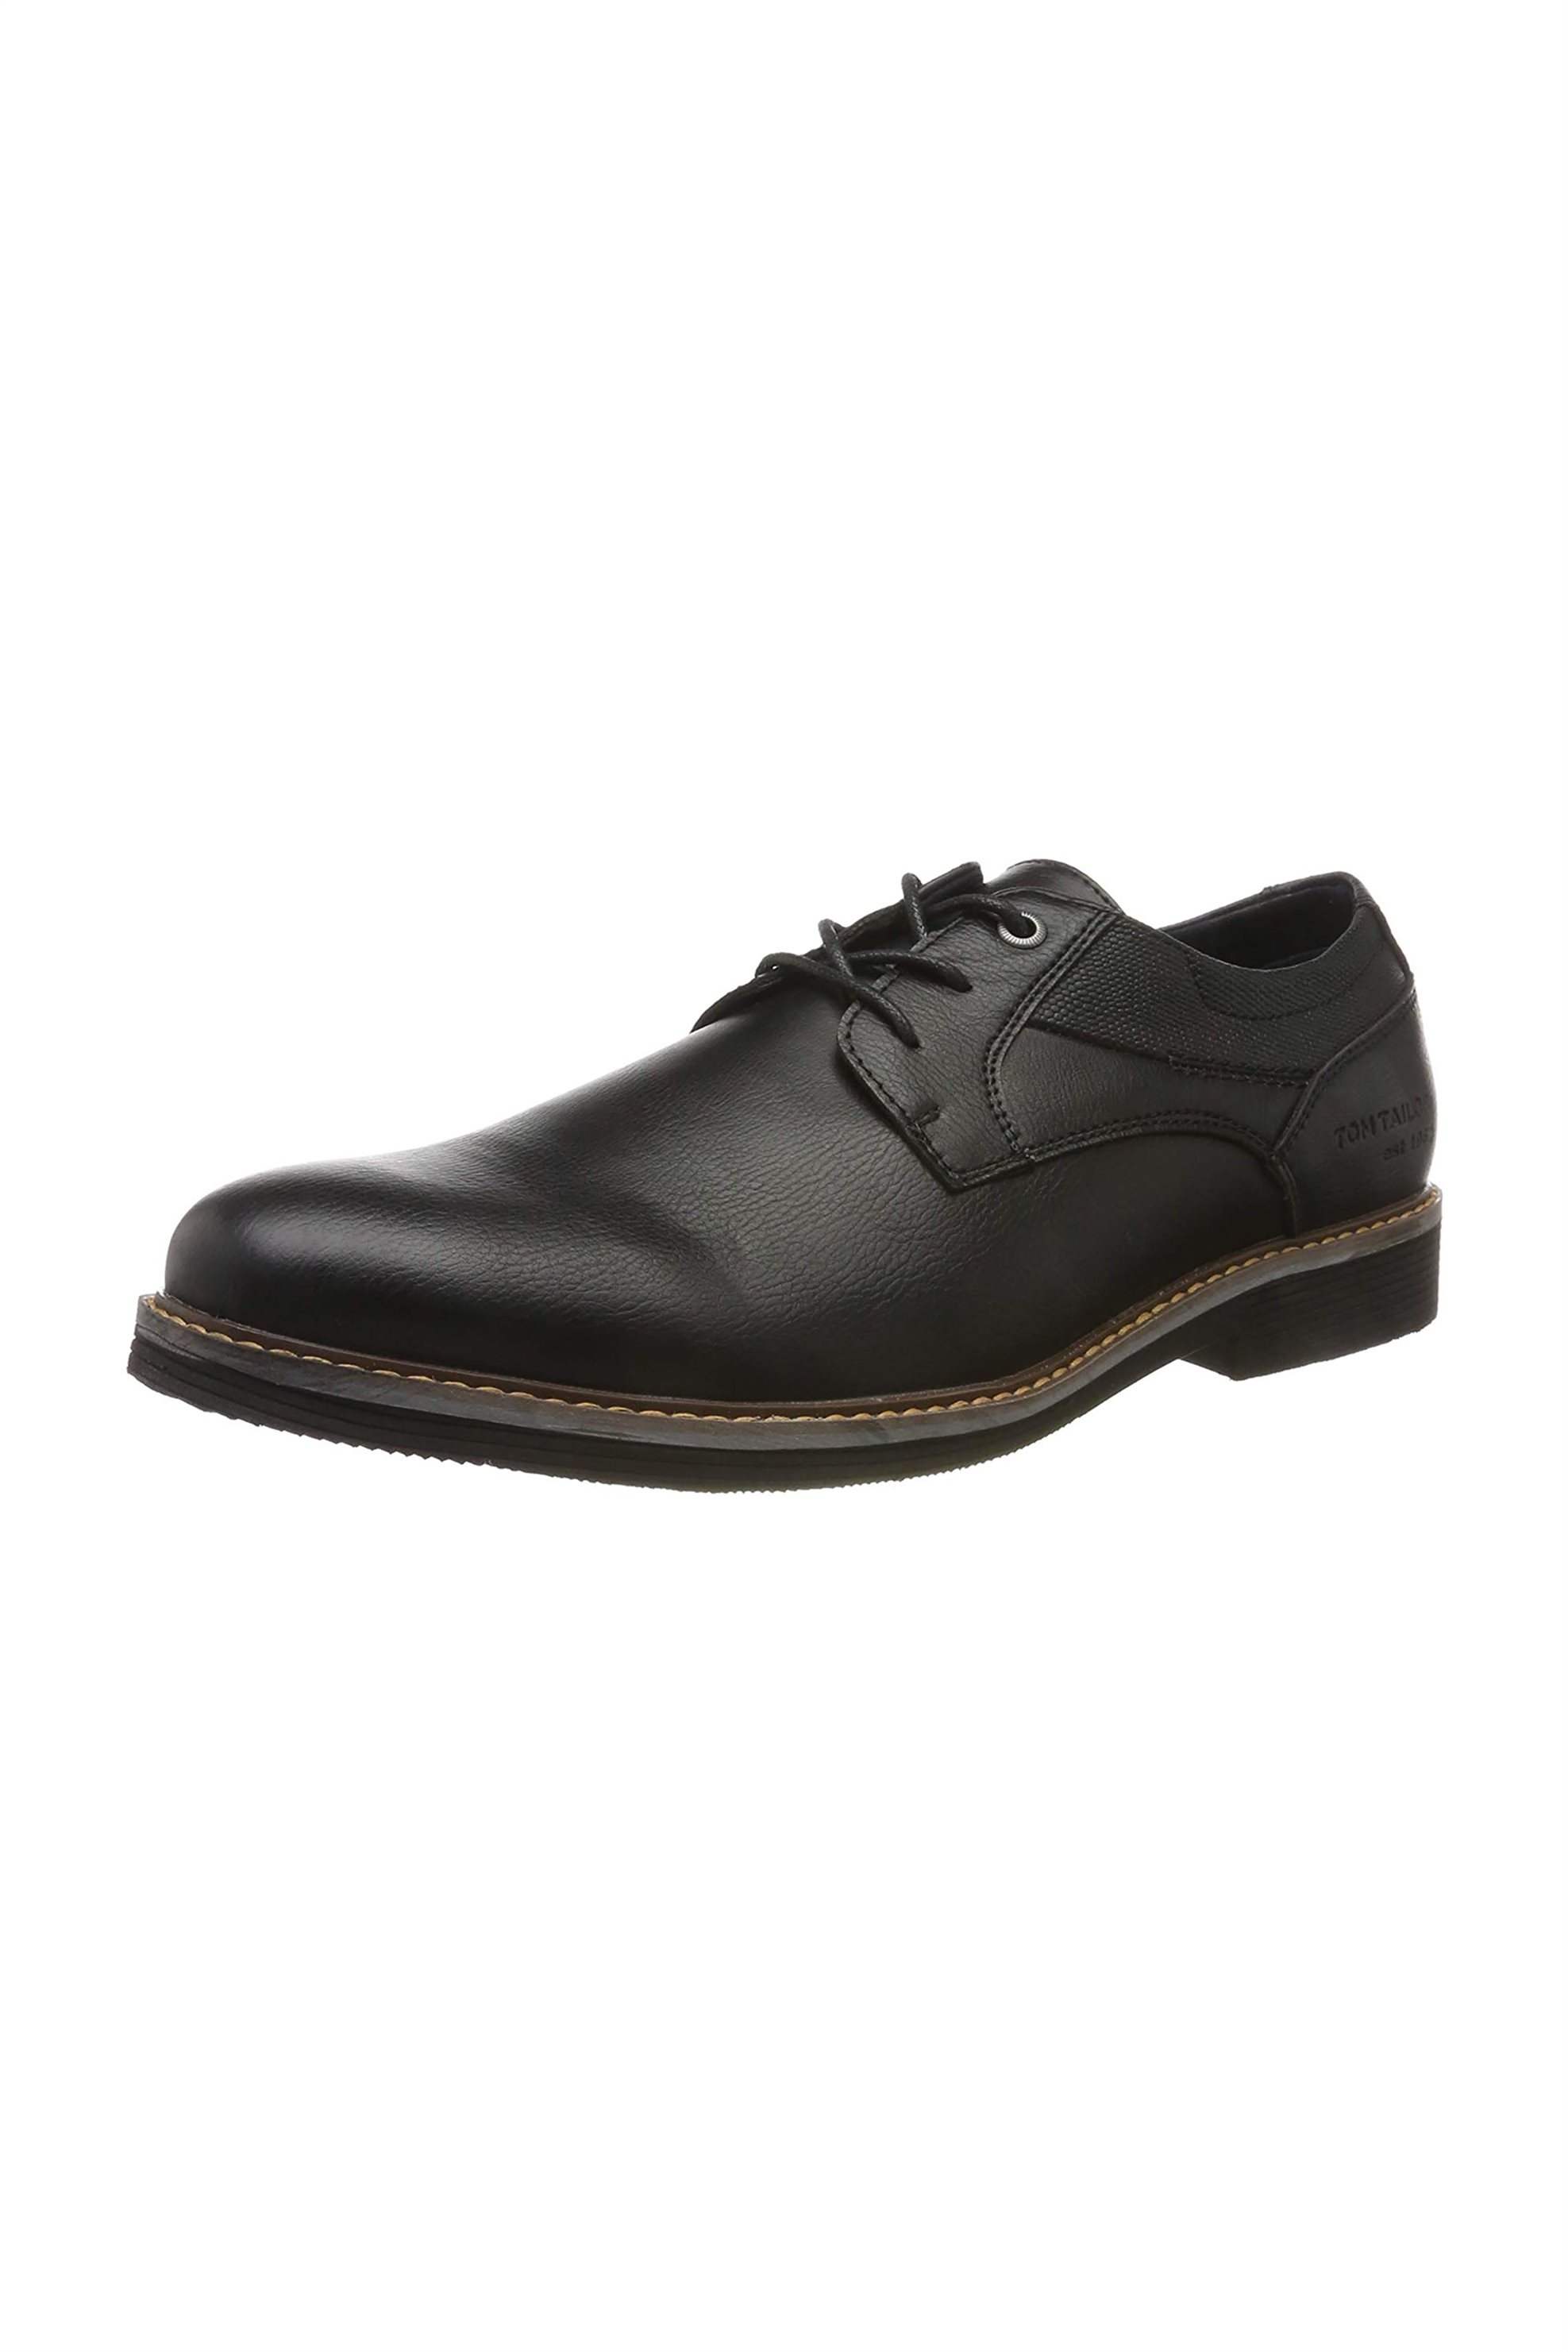 Tom Tailor ανδρικά παπούτσια oxford – 7981101 – Μαύρο